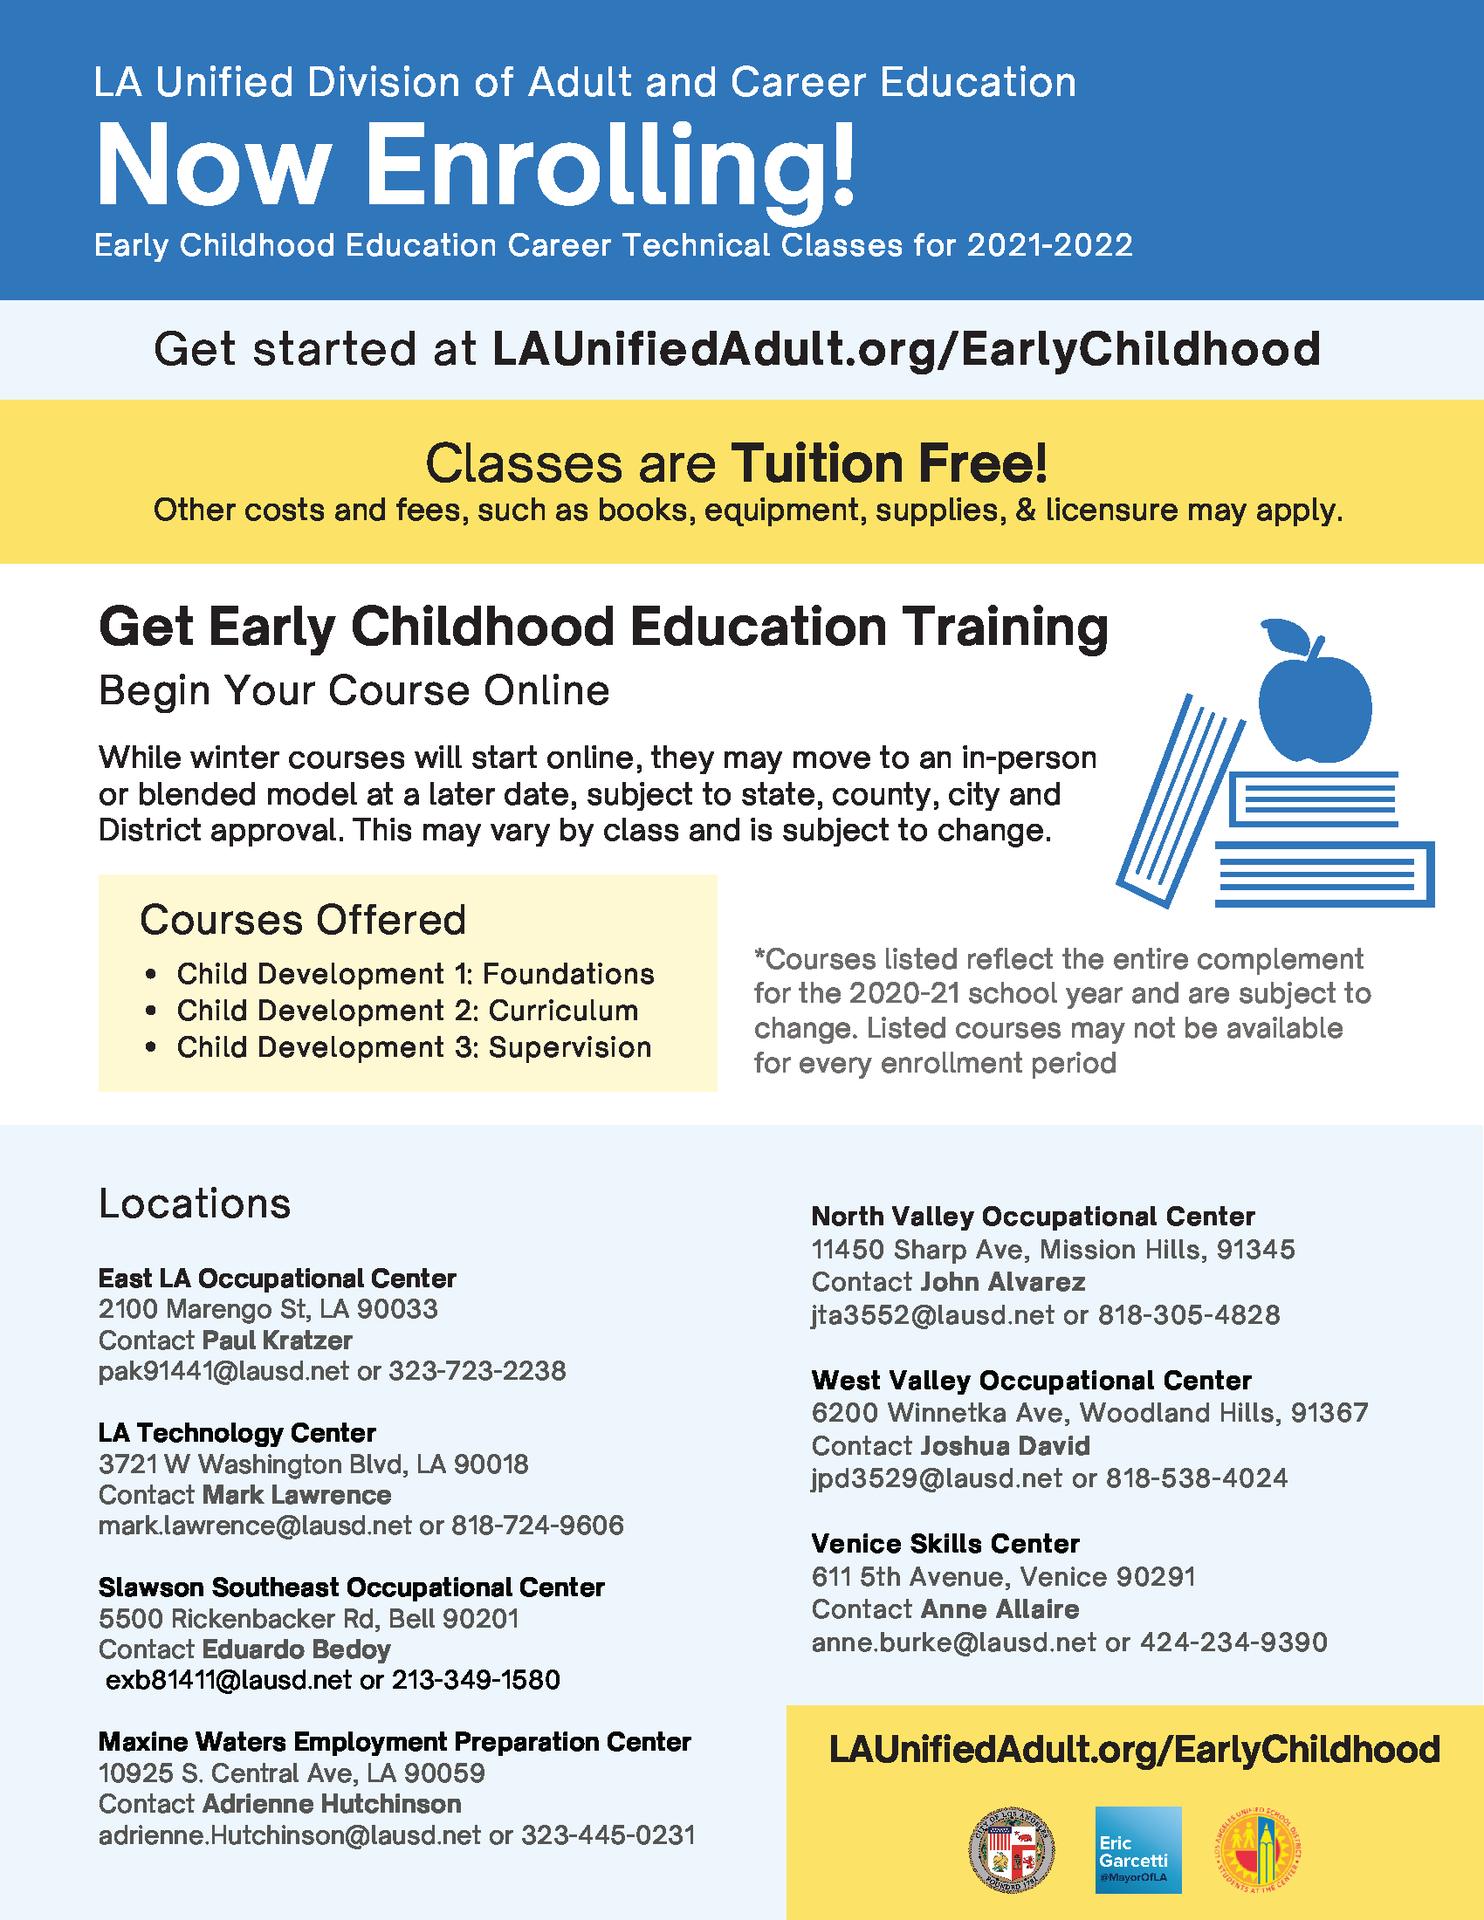 Early Childhood Education Career Flyer - English